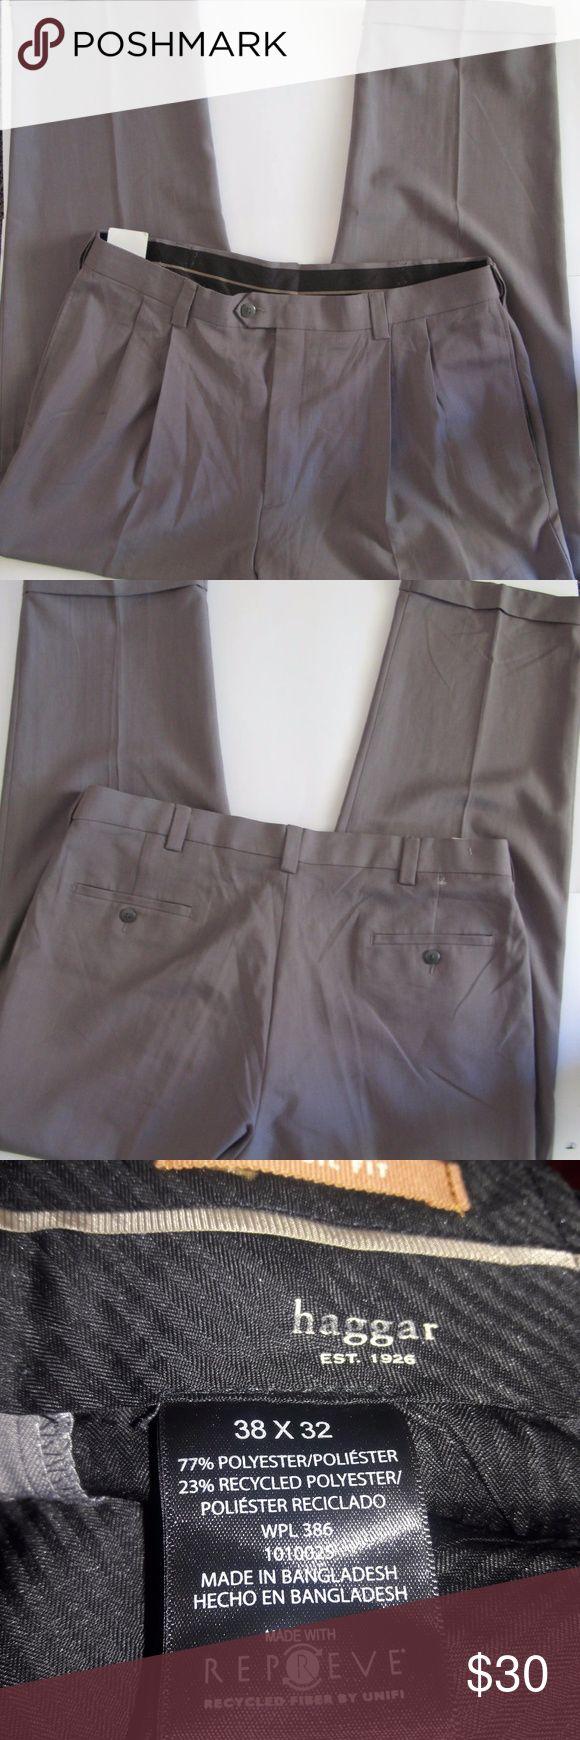 Haggar Mens Guys 38x32 Beige Tan Dress Pants Caree Haggar Mens Guys 38x32 Beige Tan Dress Pants Career Work Trousers Haggar Pants Dress